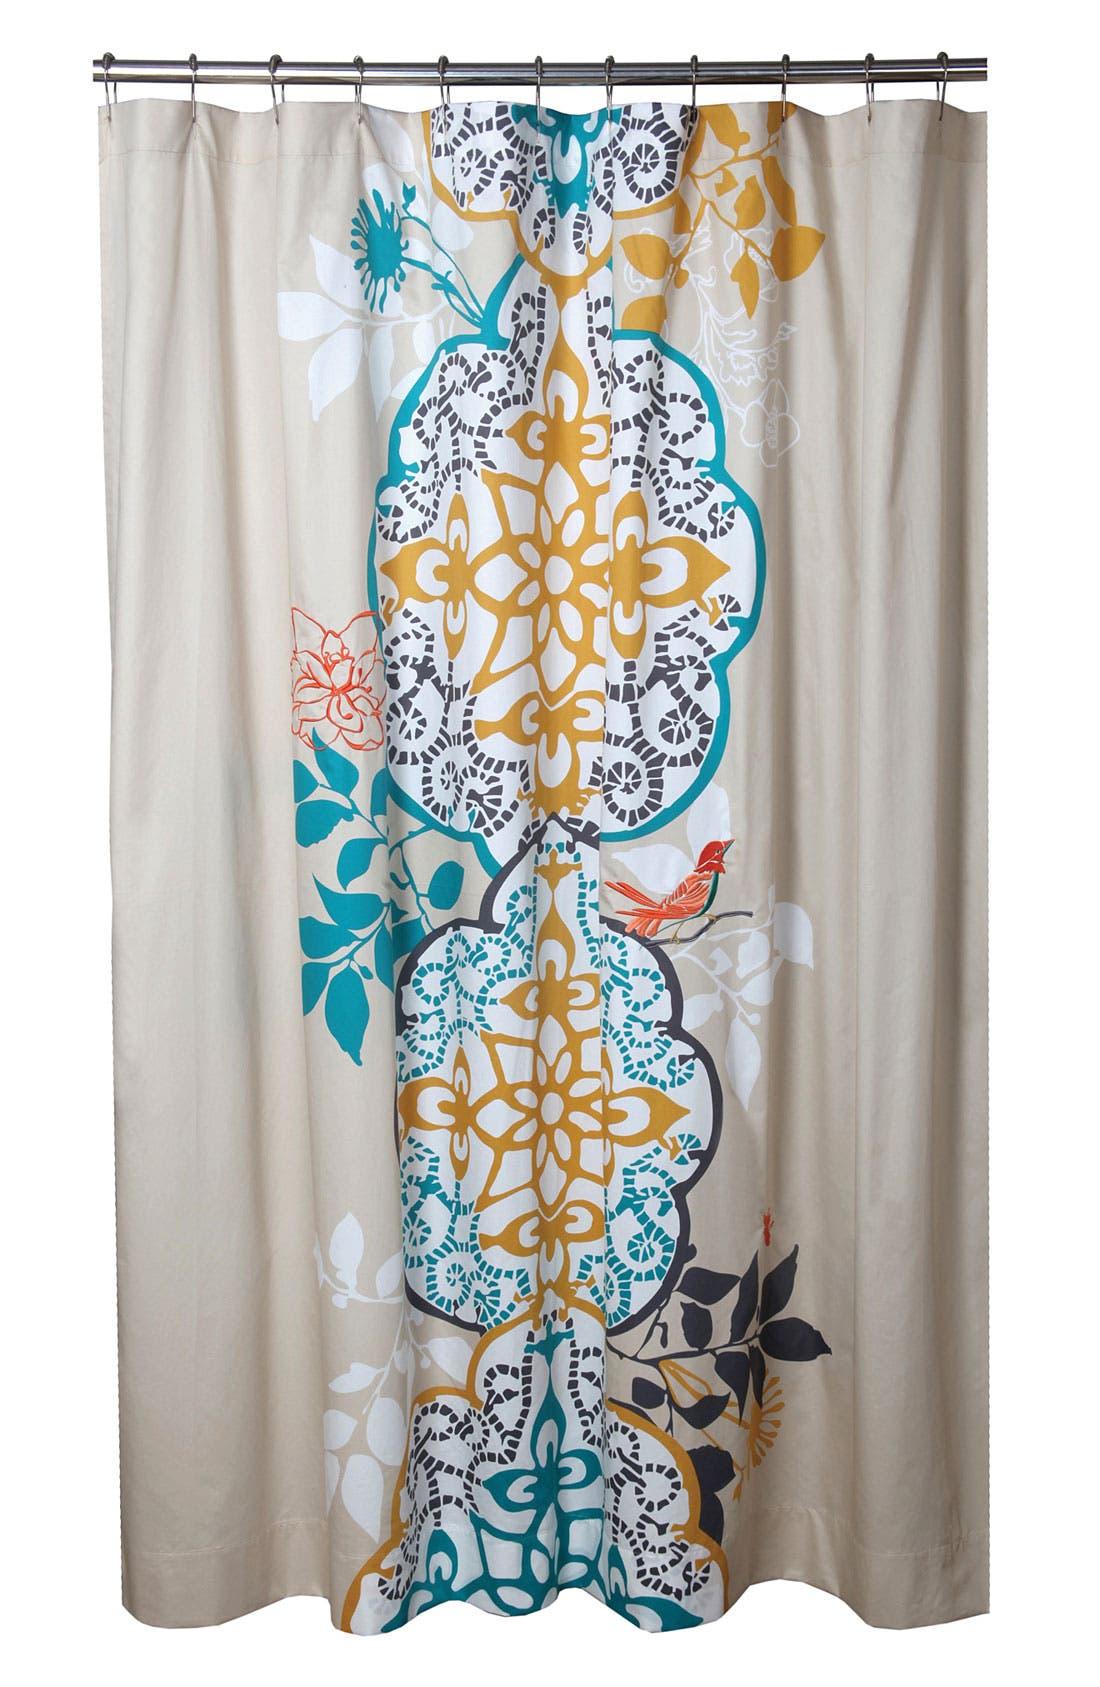 Alternate Image 1 Selected - Blissliving Home 'Shangri-La' Shower Curtain (Online Only)